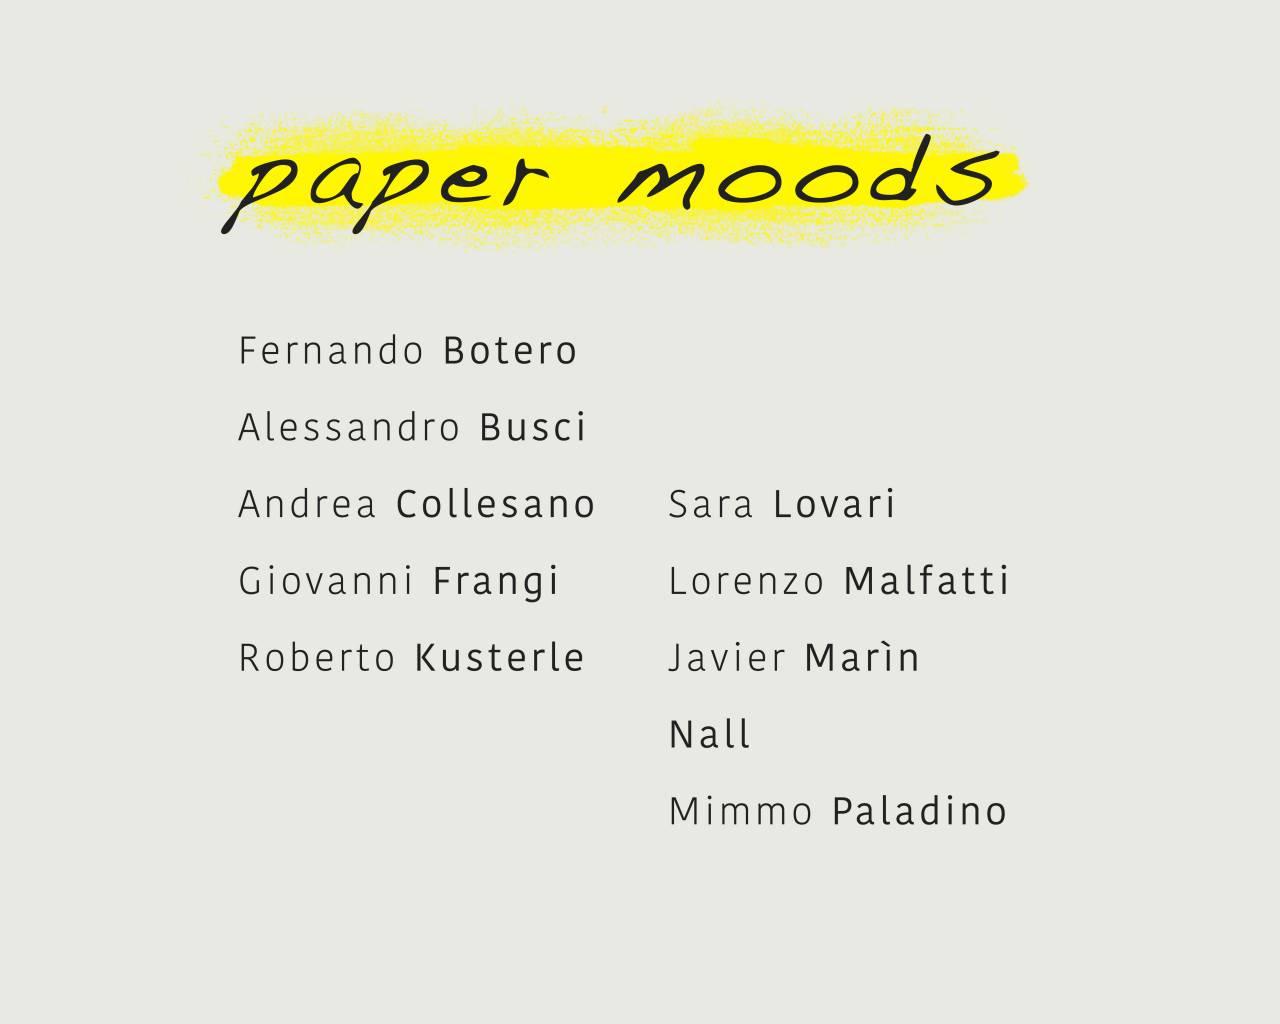 paper moods - Settembre - Ottobre 2020 - Galleria d